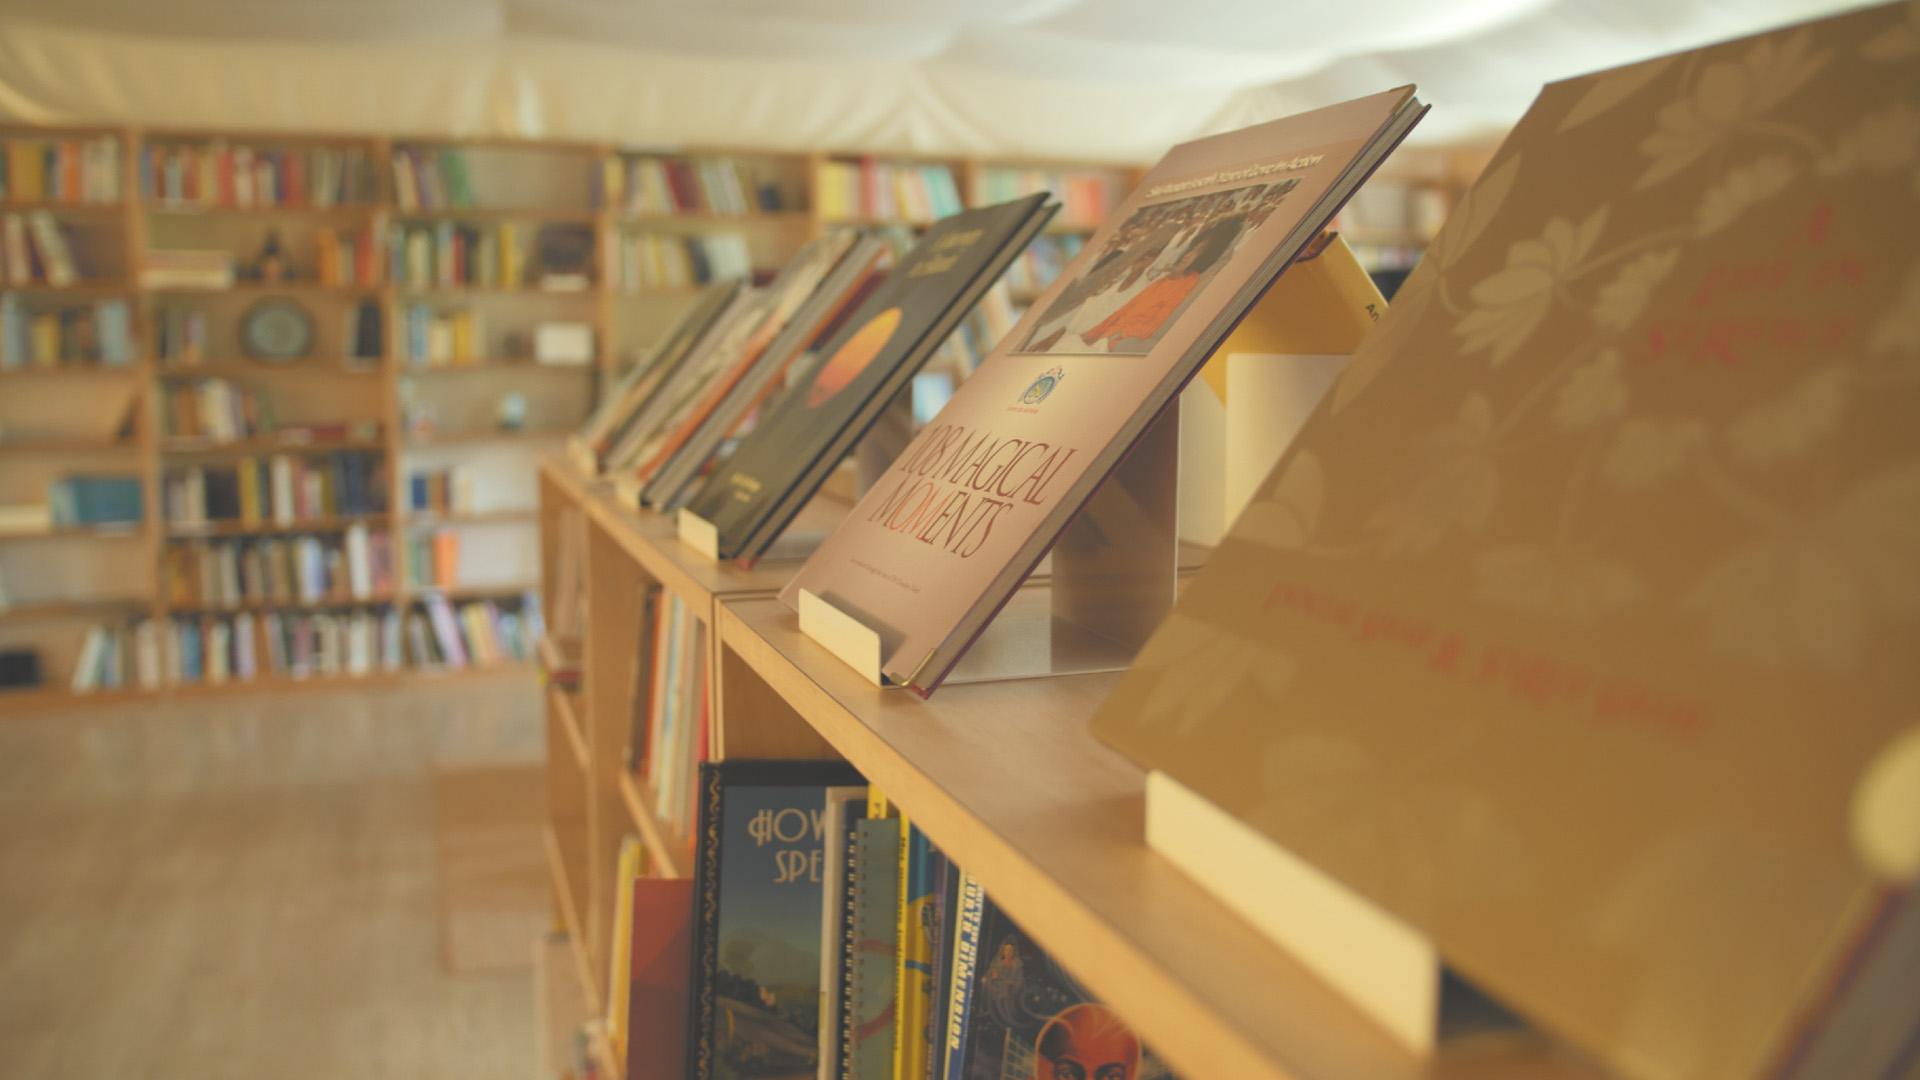 camping de kroon oirschot spirituele bibliotheek